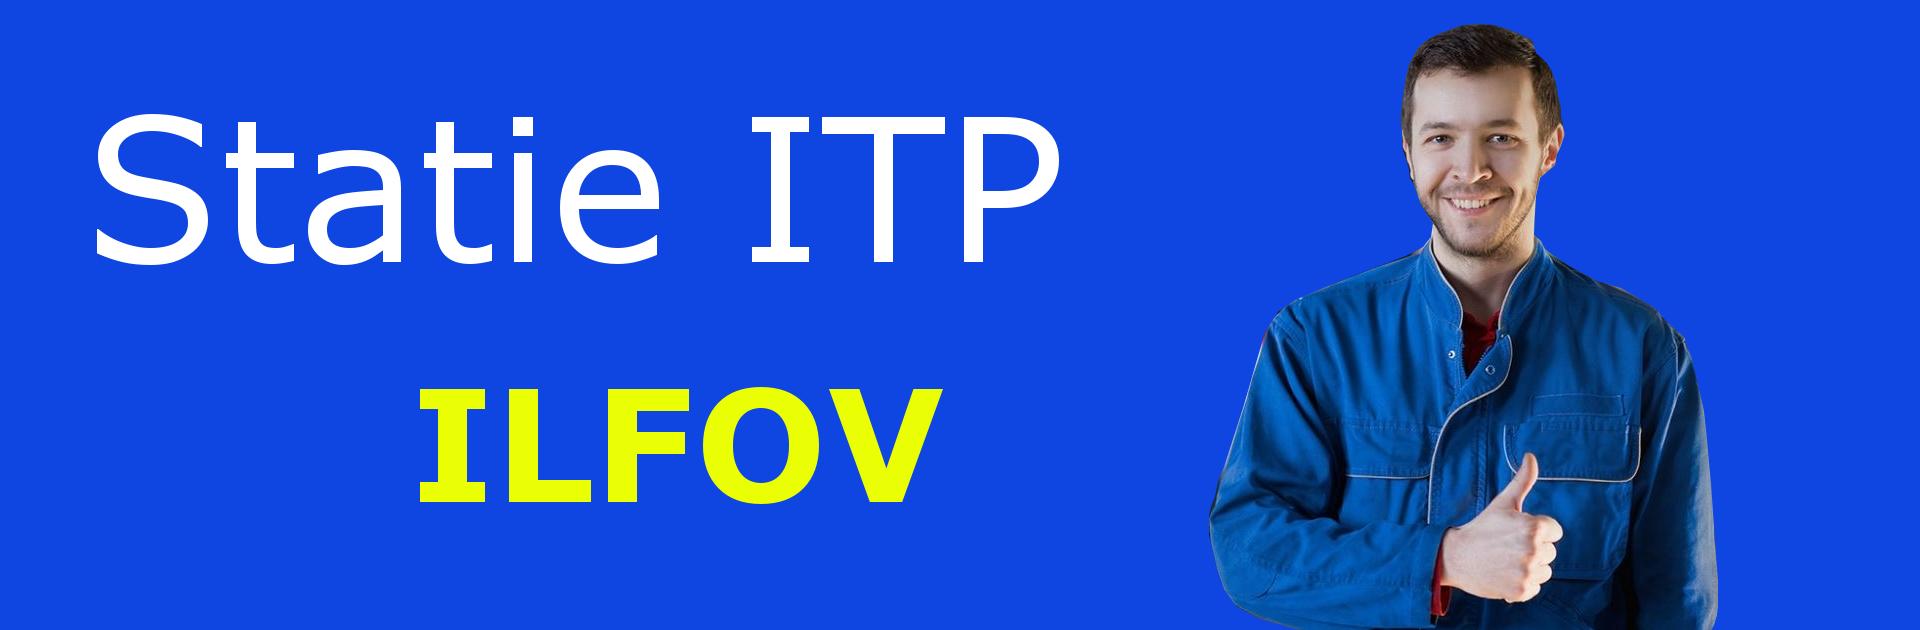 Banner ITP ILFOV